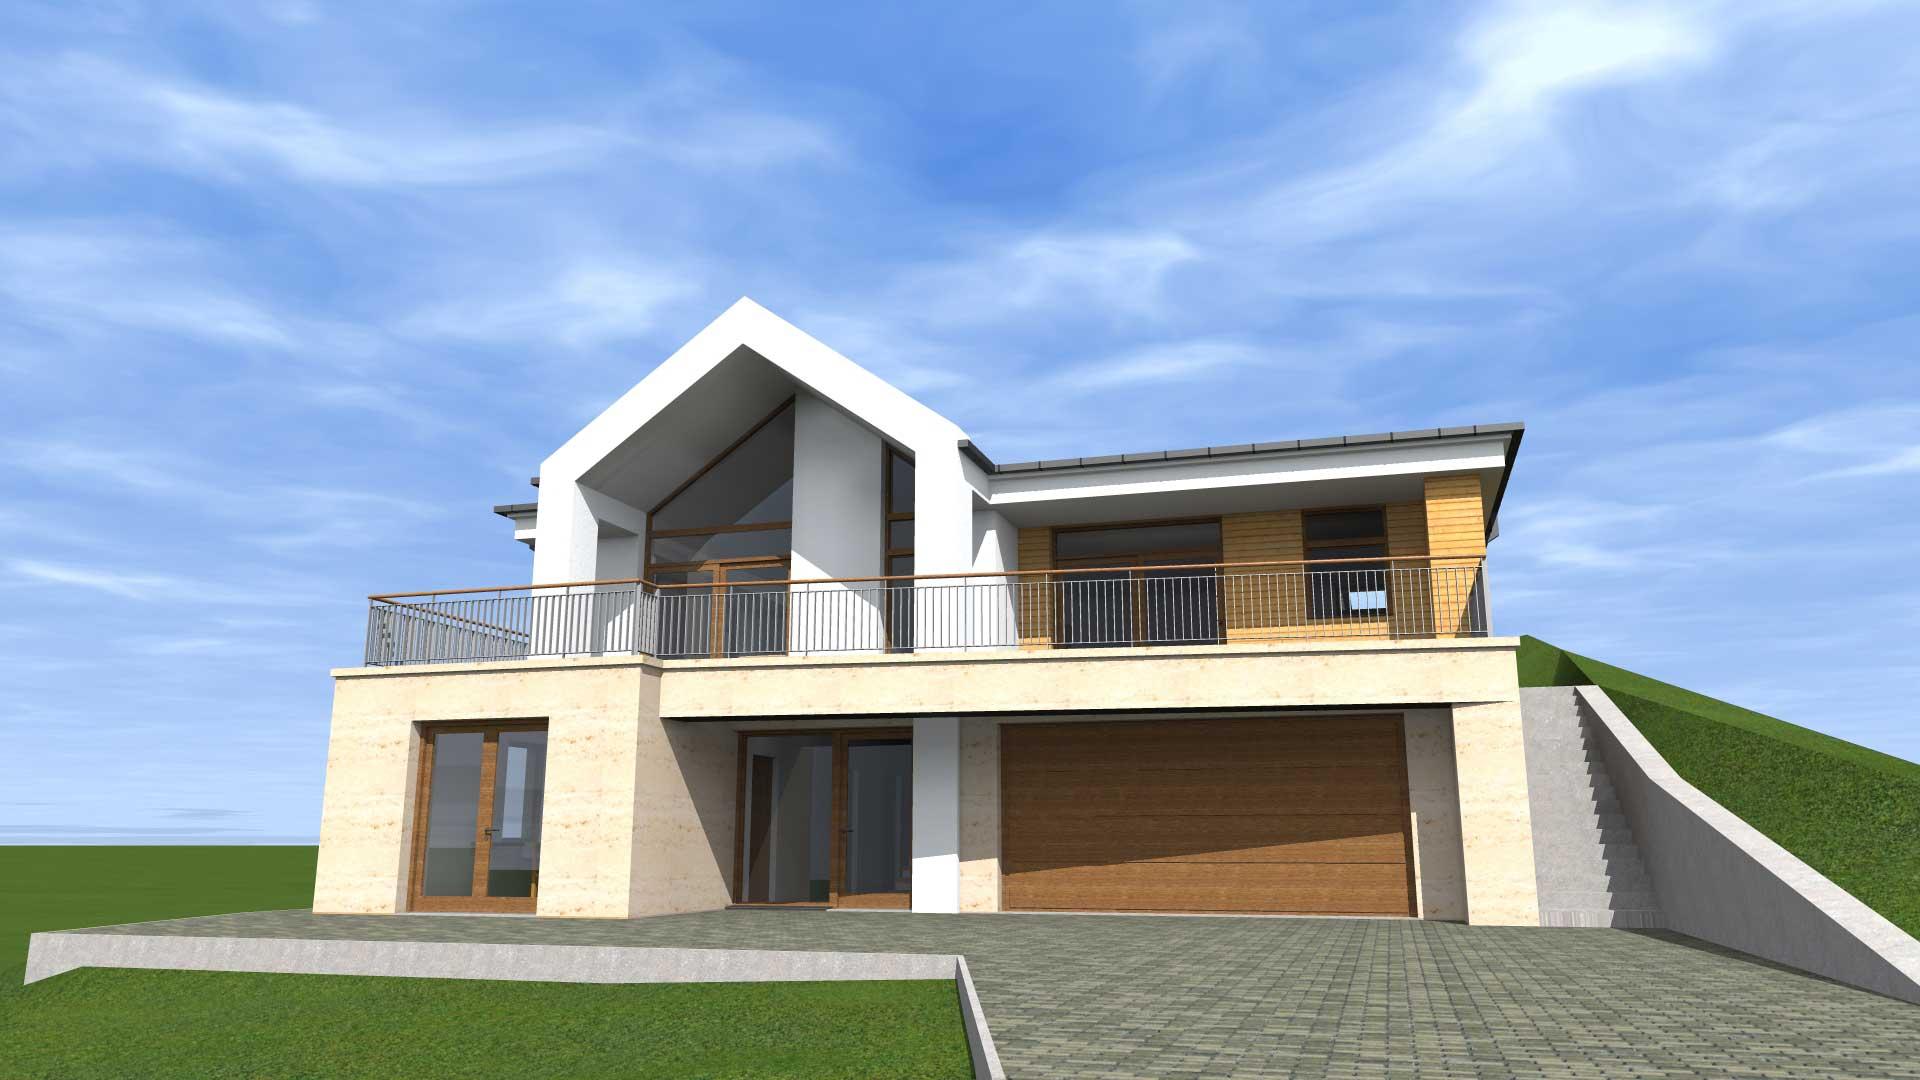 Luxus ingatlan tervezése Balaton